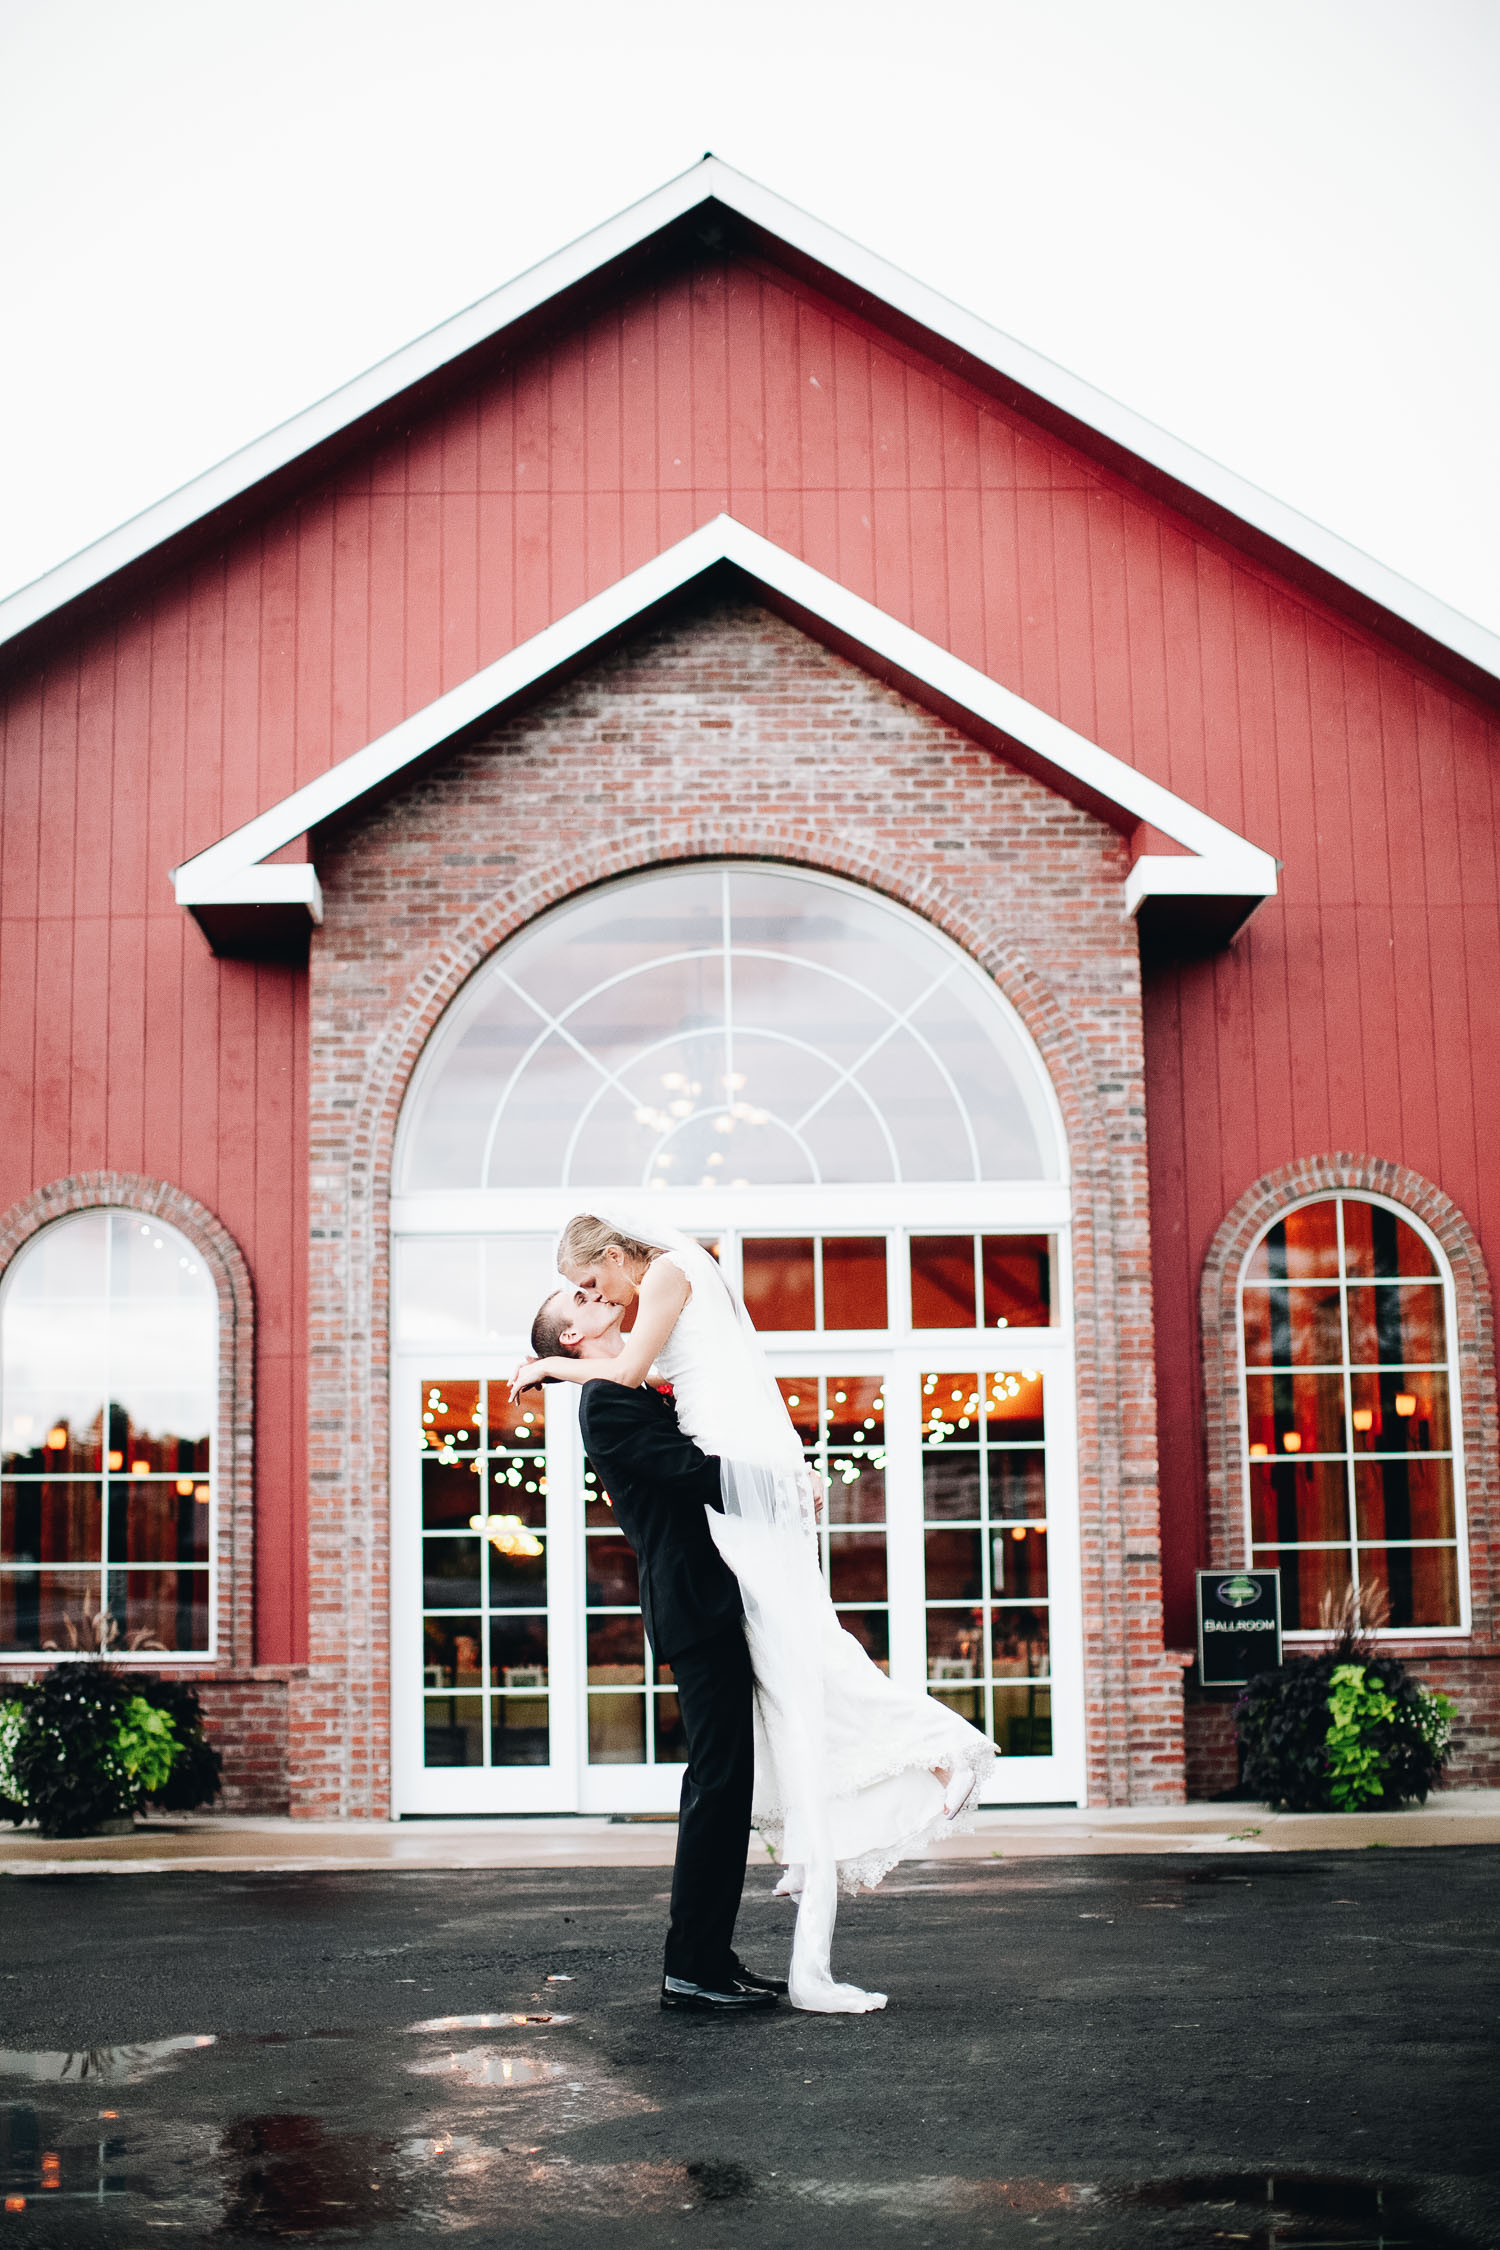 JMPHOTOART-Wedding-Photographer-173.jpg